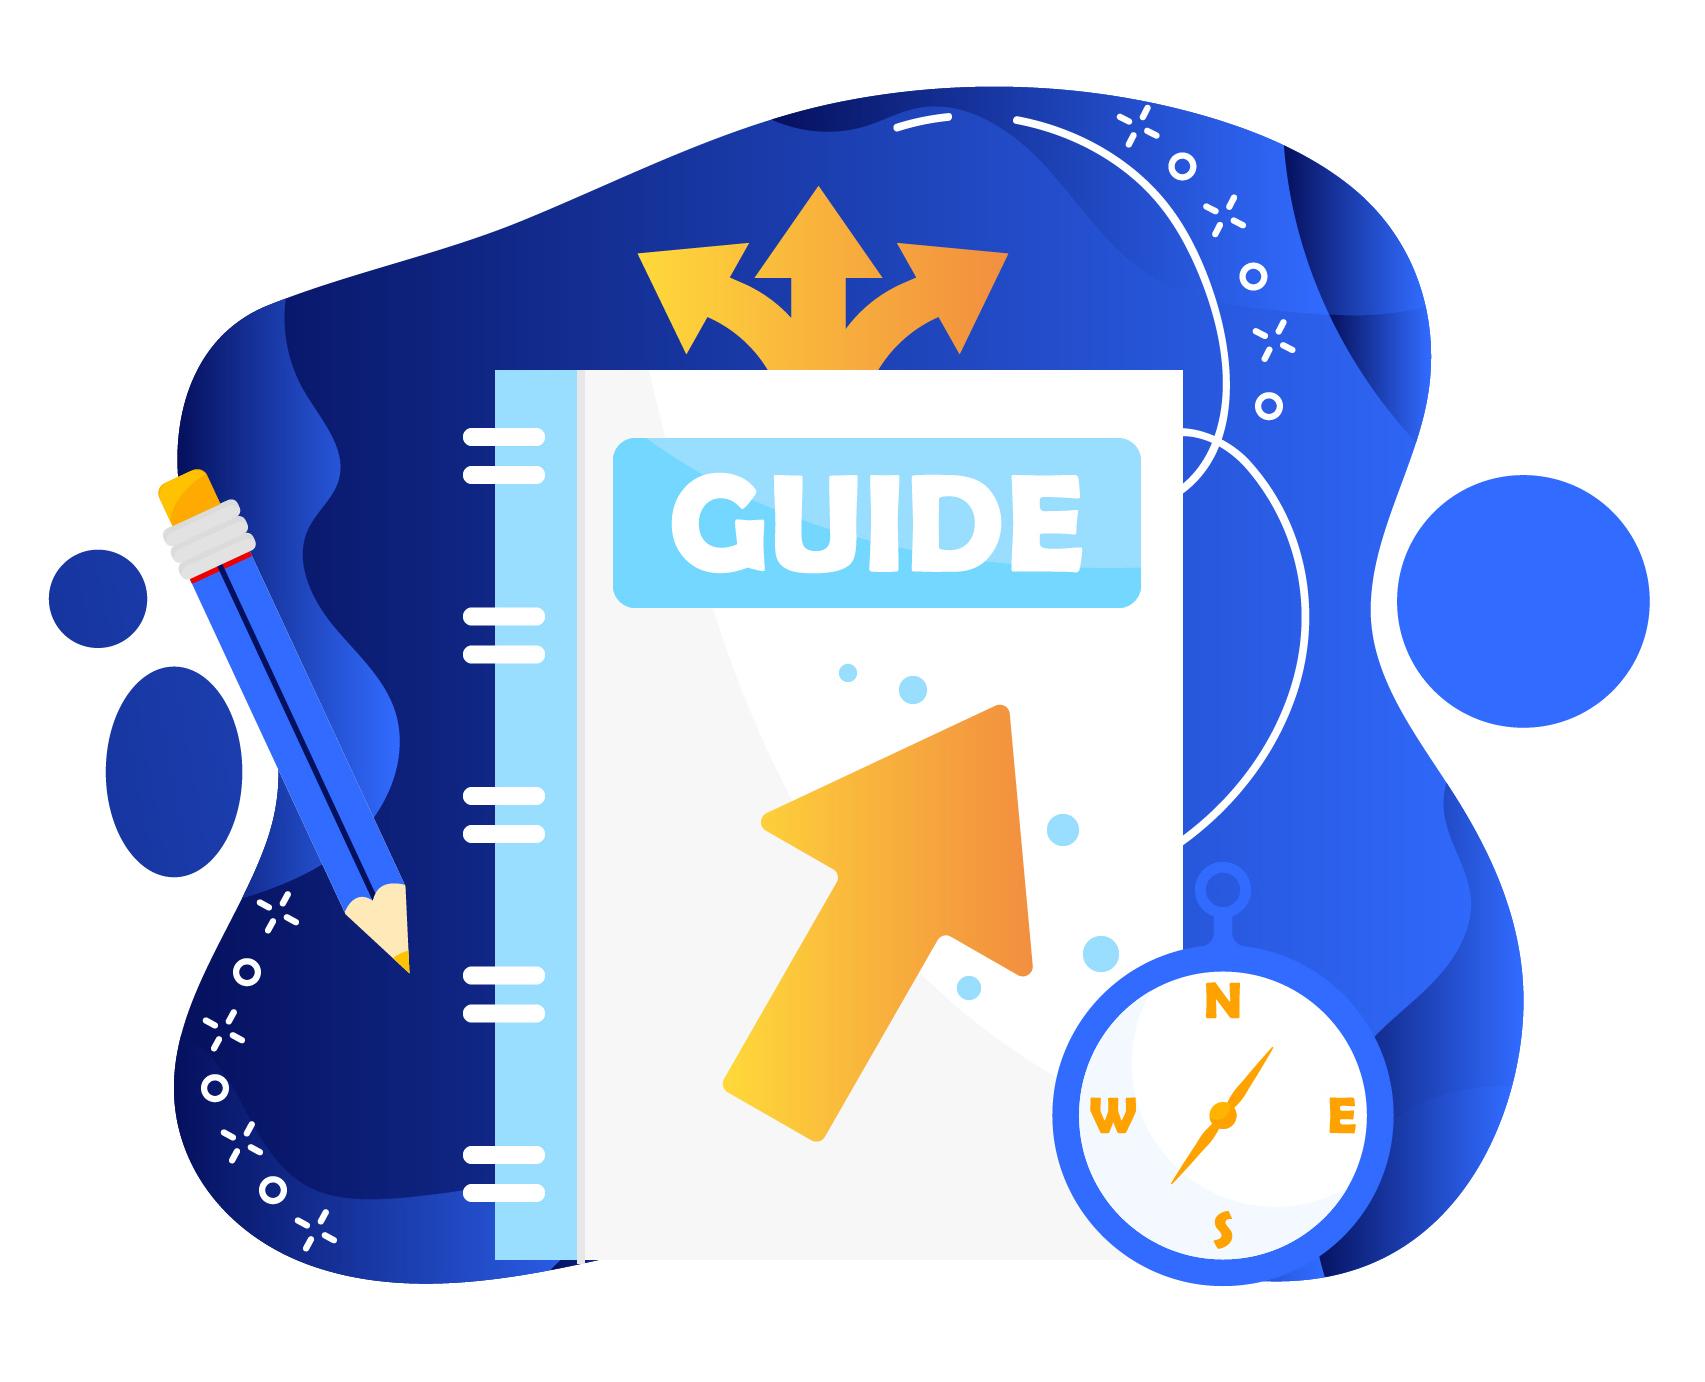 small business web design services graphic